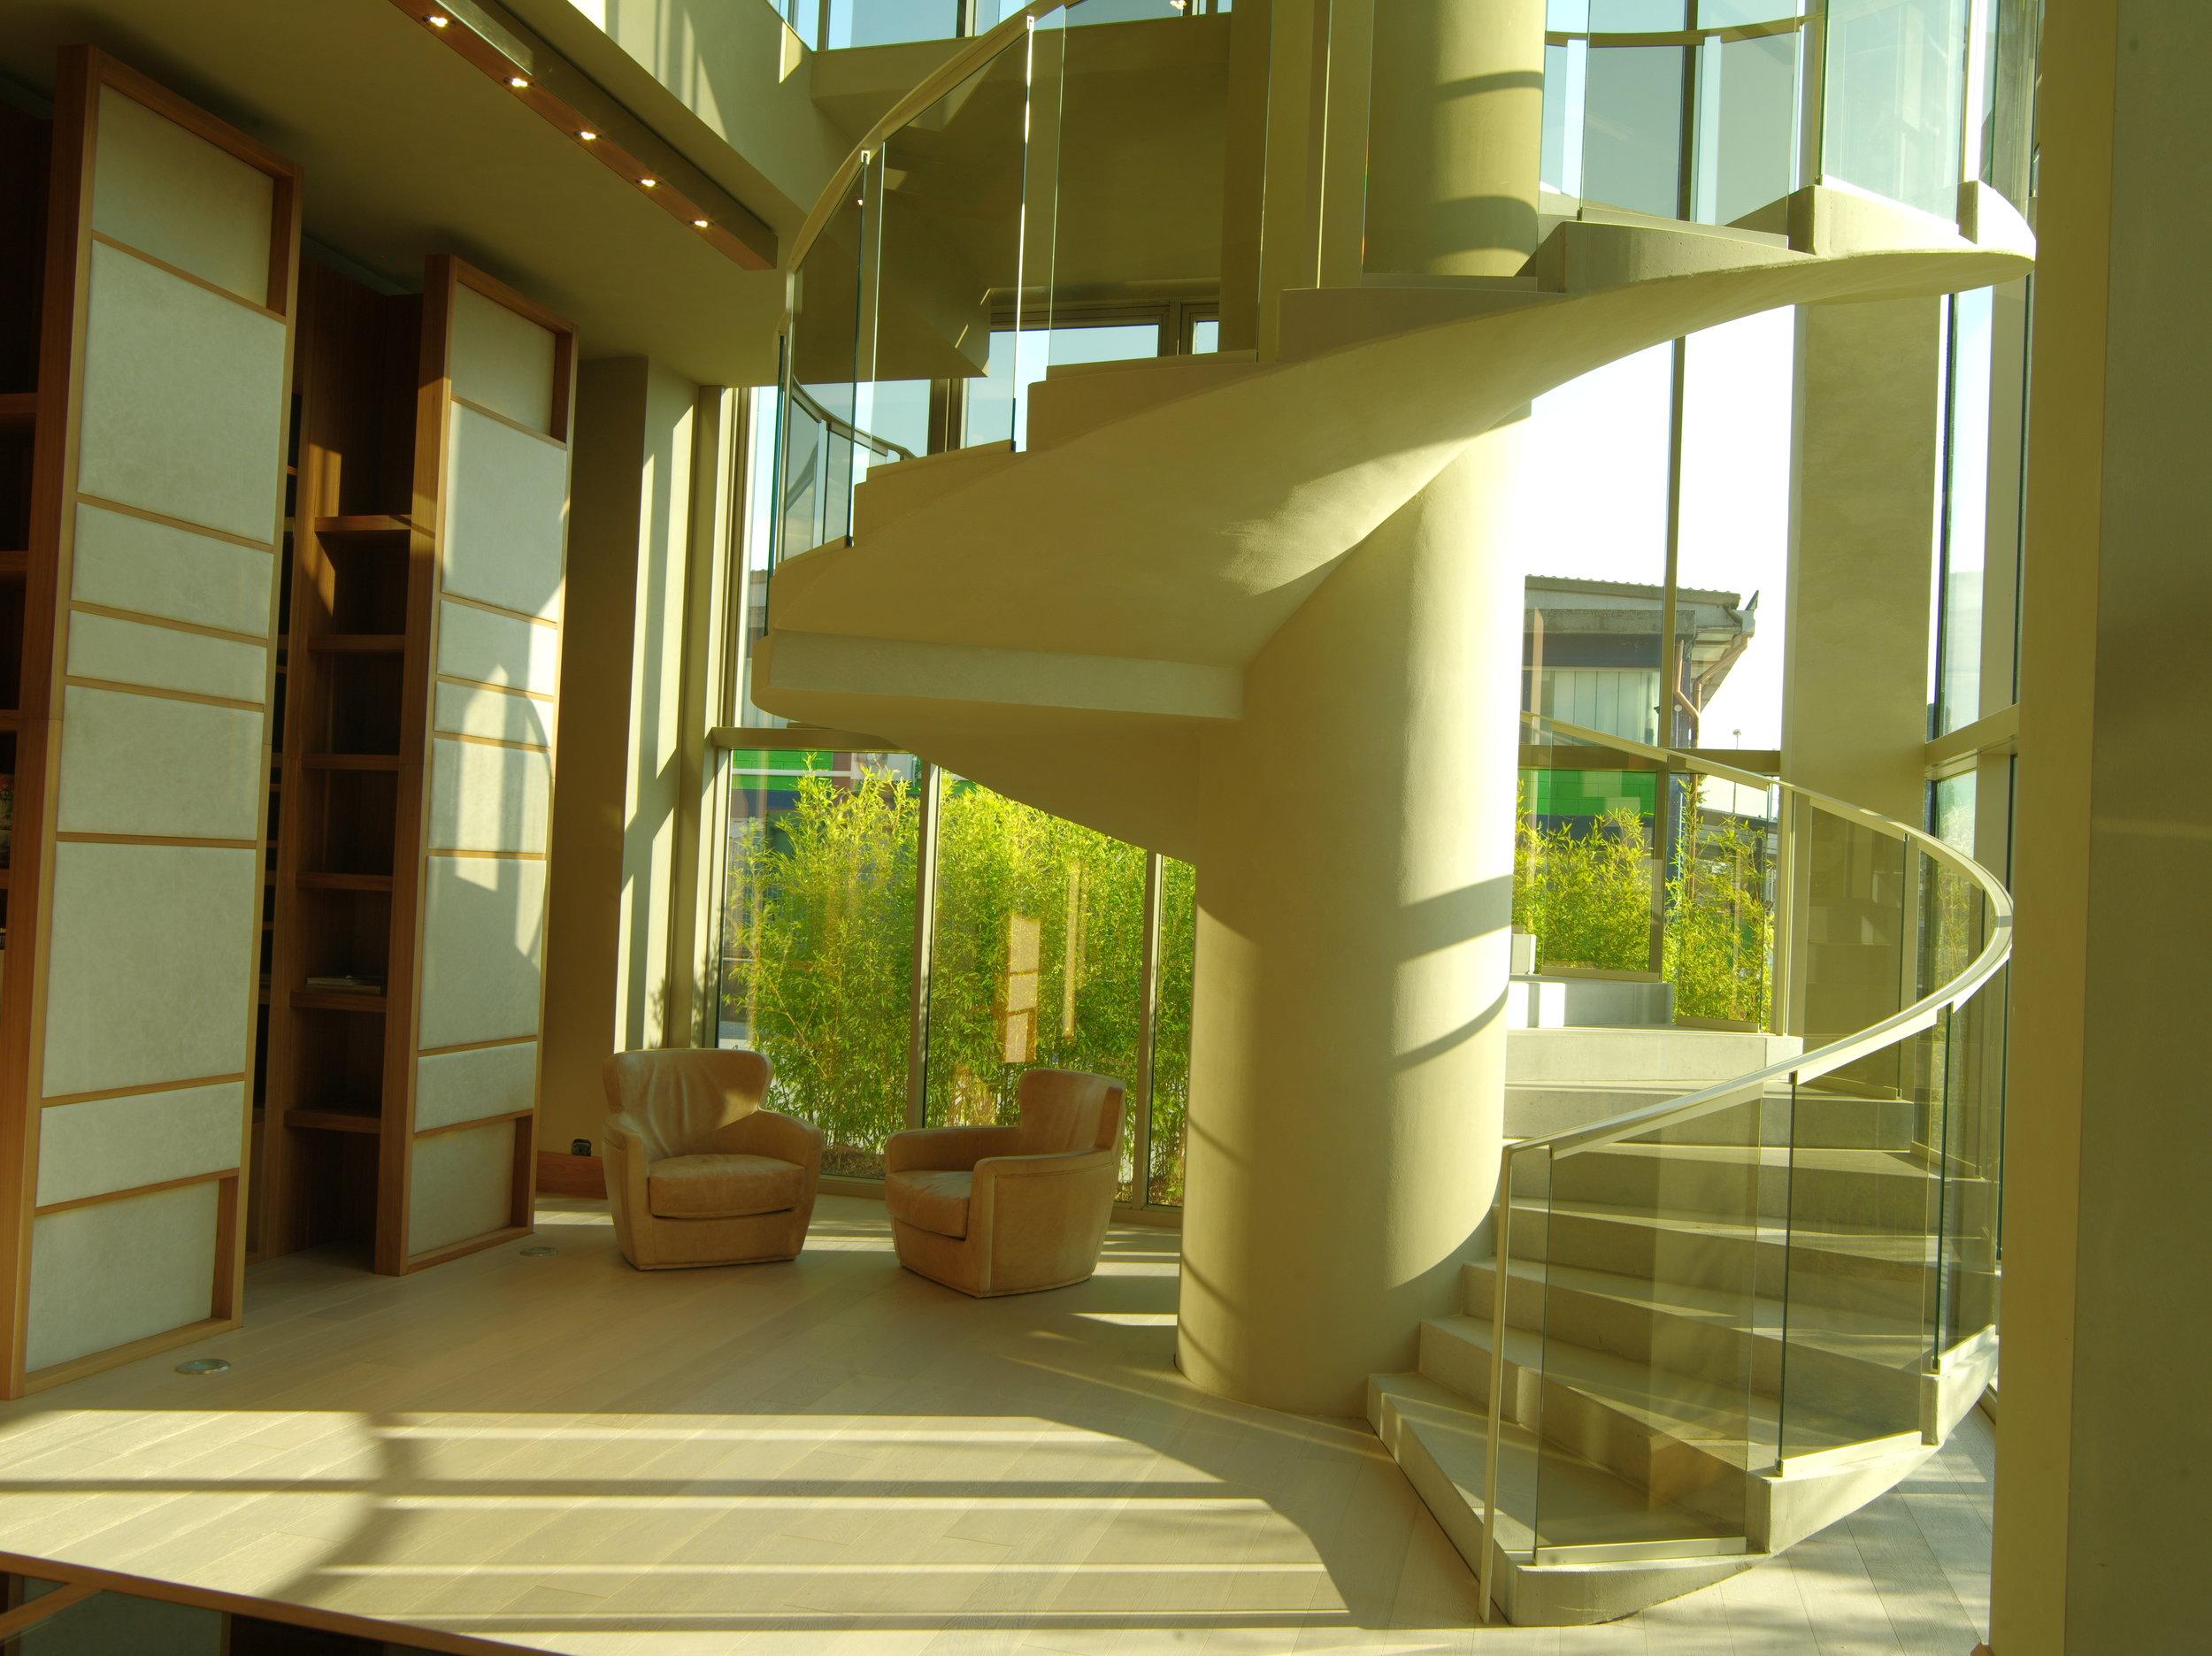 Ulivi Salotti office entrance - An Ode to Leathers - Masha Shapiro Agency.JPG